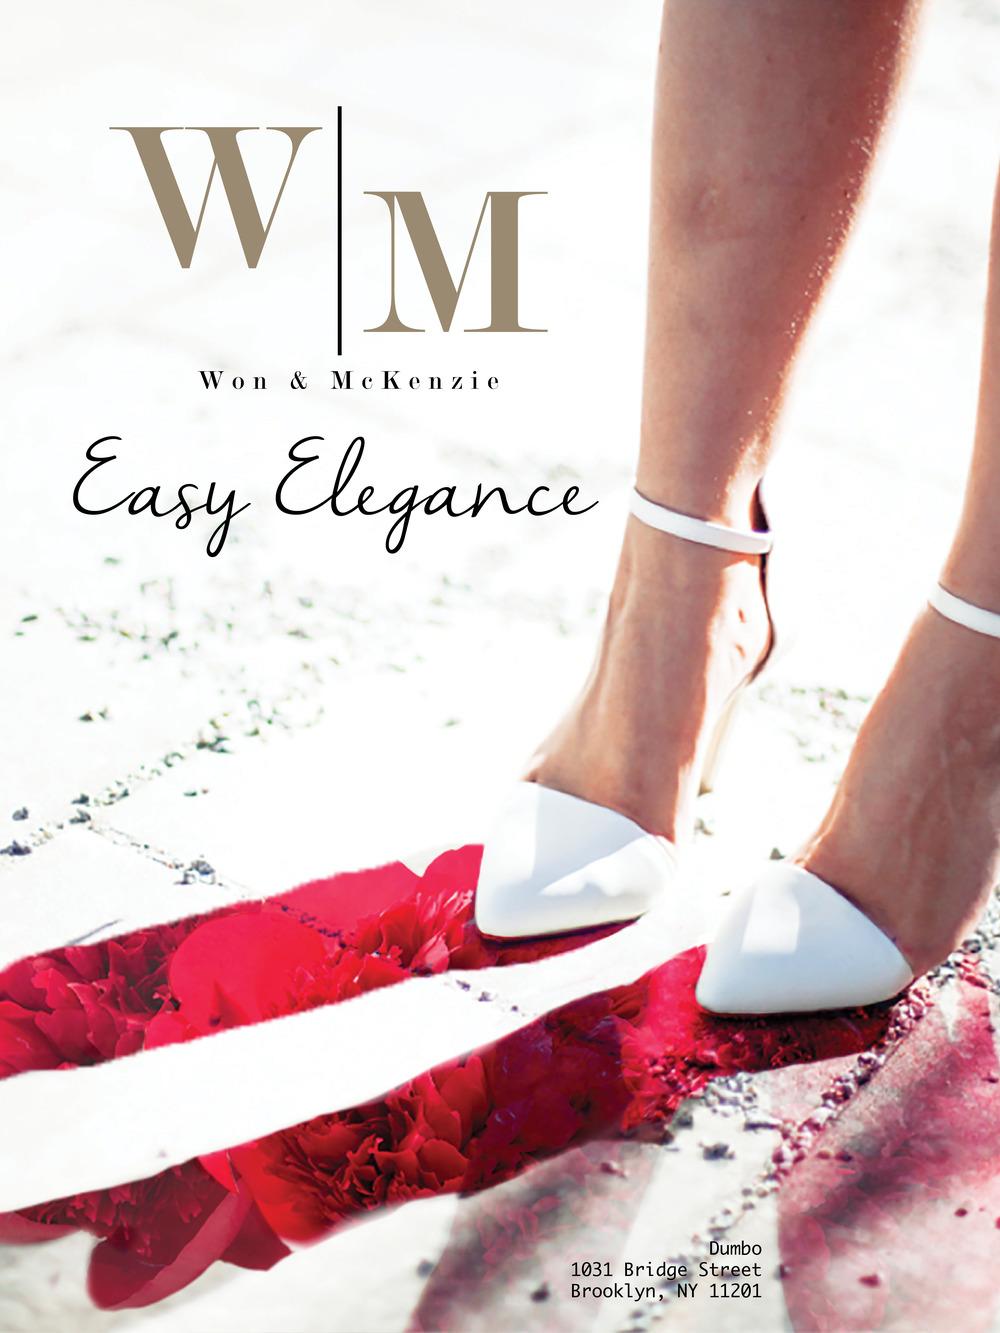 W&M_Poster1.jpg